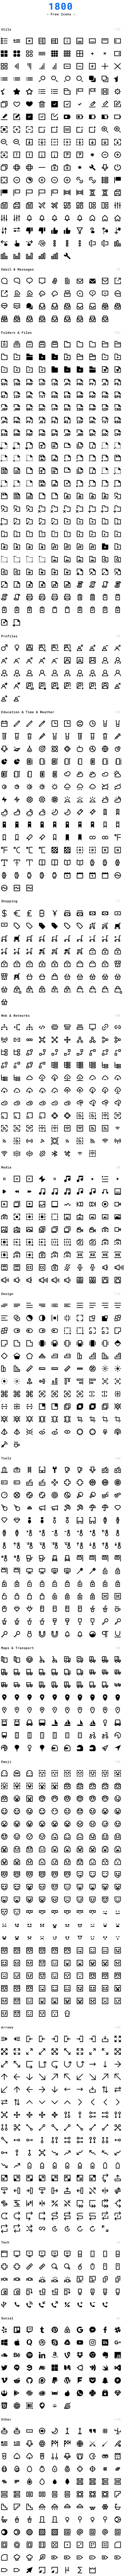 1800 Free Minimal Icon Pack (.Ai + .Psd + .Sketch + .Svg) скачать бесплатно